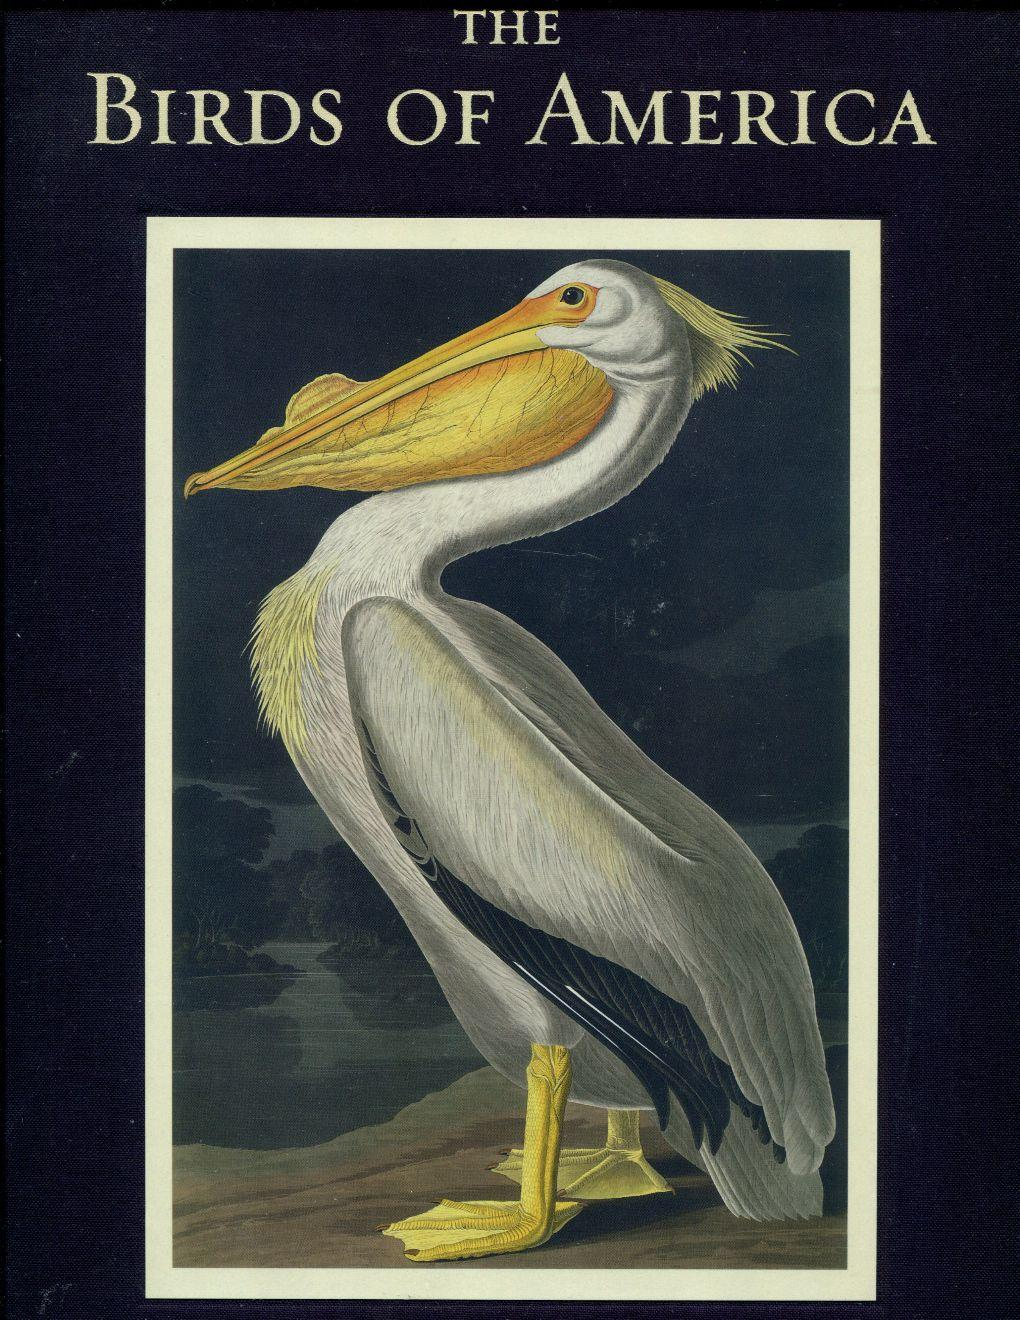 John James Audubon/'s Watercolor Artwork Yellow-Bellied Flycatcher Vintage 1937 Birds of America Book Print